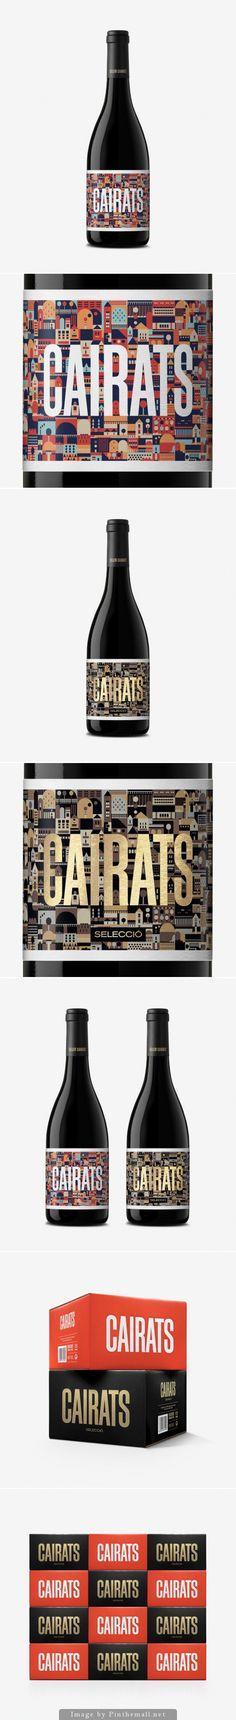 Cairats #wine #packaging by Dorian - http://www.packagingoftheworld.com/2014/10/cairats.html